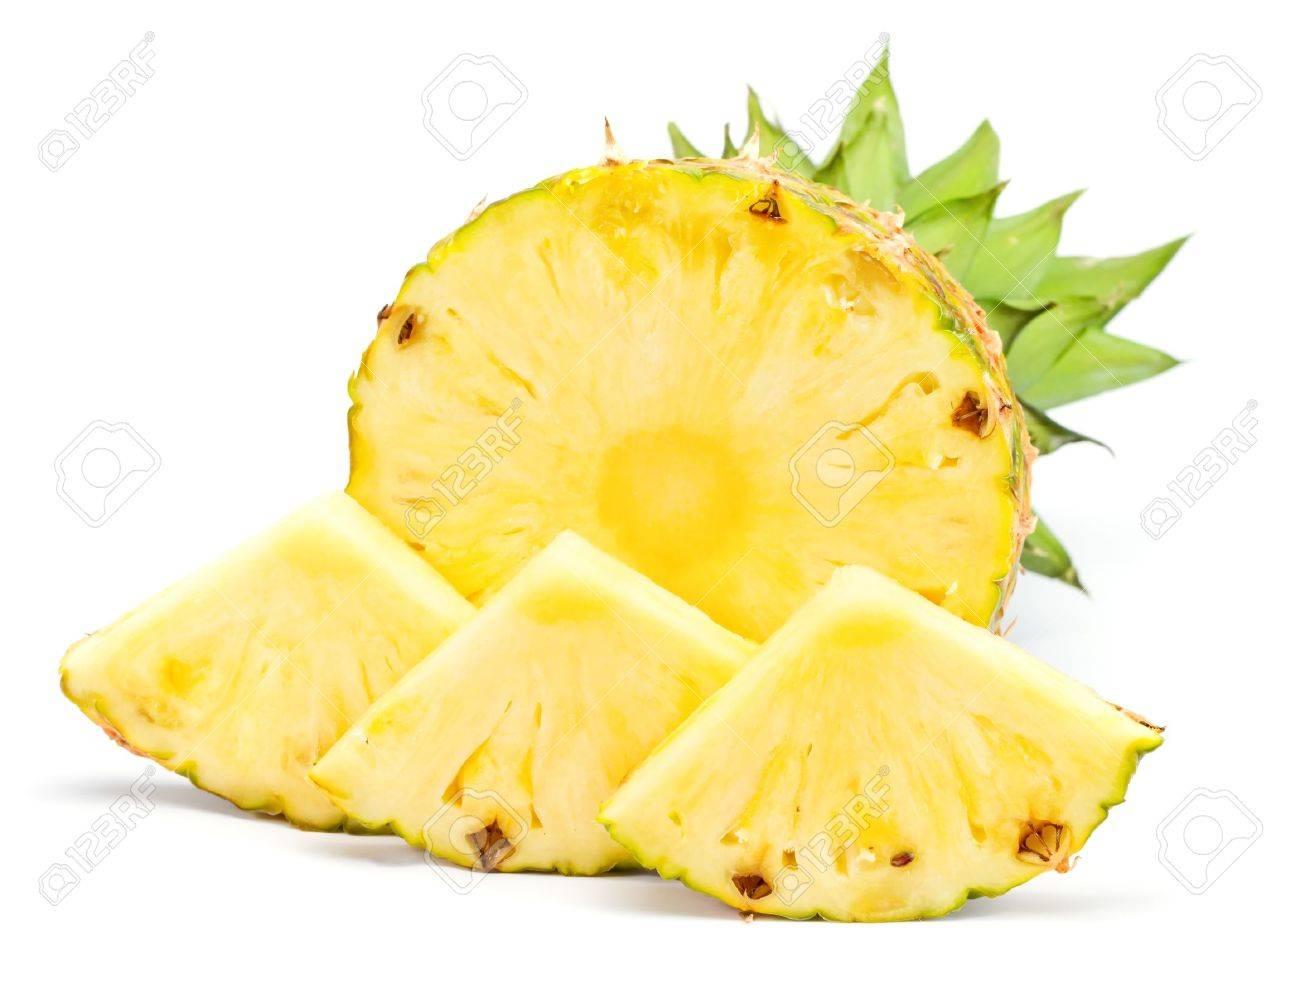 Fresh slice pineapple on white background - 9939852